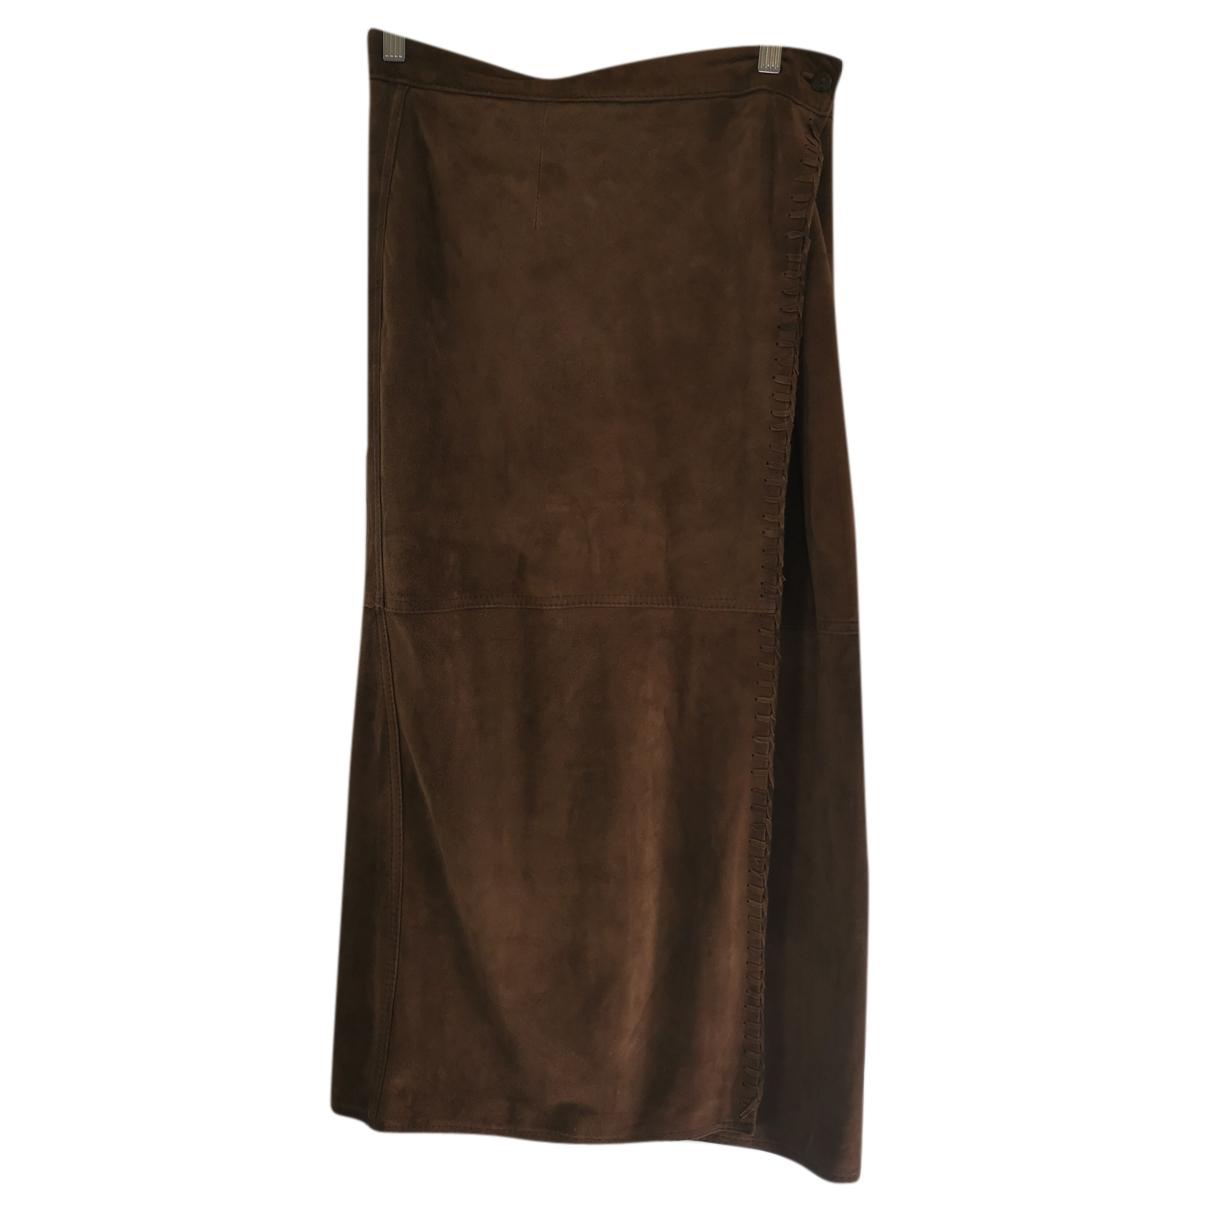 Timberland - Jupe   pour femme en suede - beige